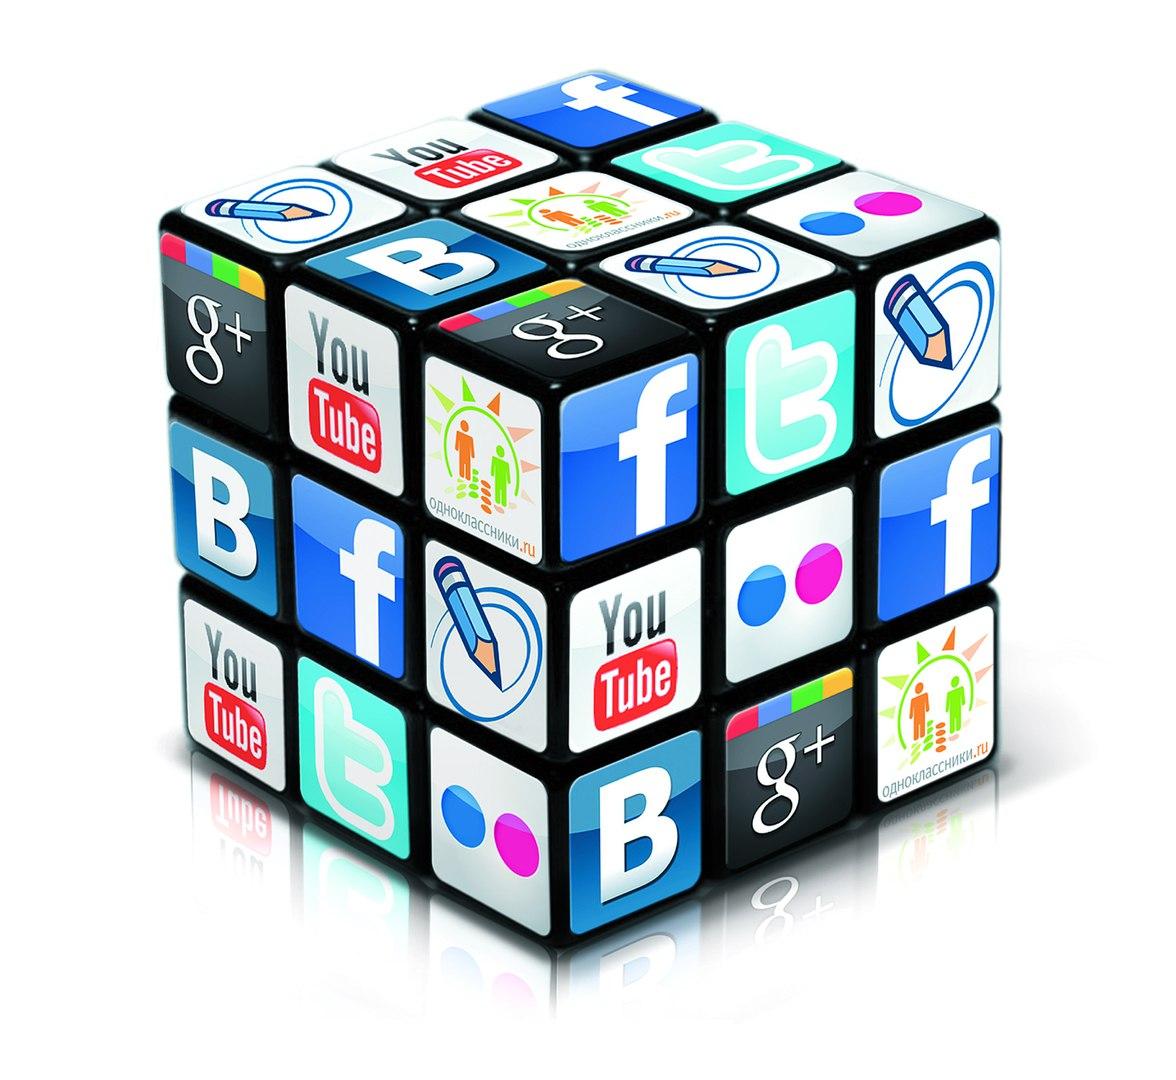 yg 0AzZepX0 Думаете, отказаться от социальных сетей легко? Ошибаетесь! sotsialnye seti psihologiya razvitie interest